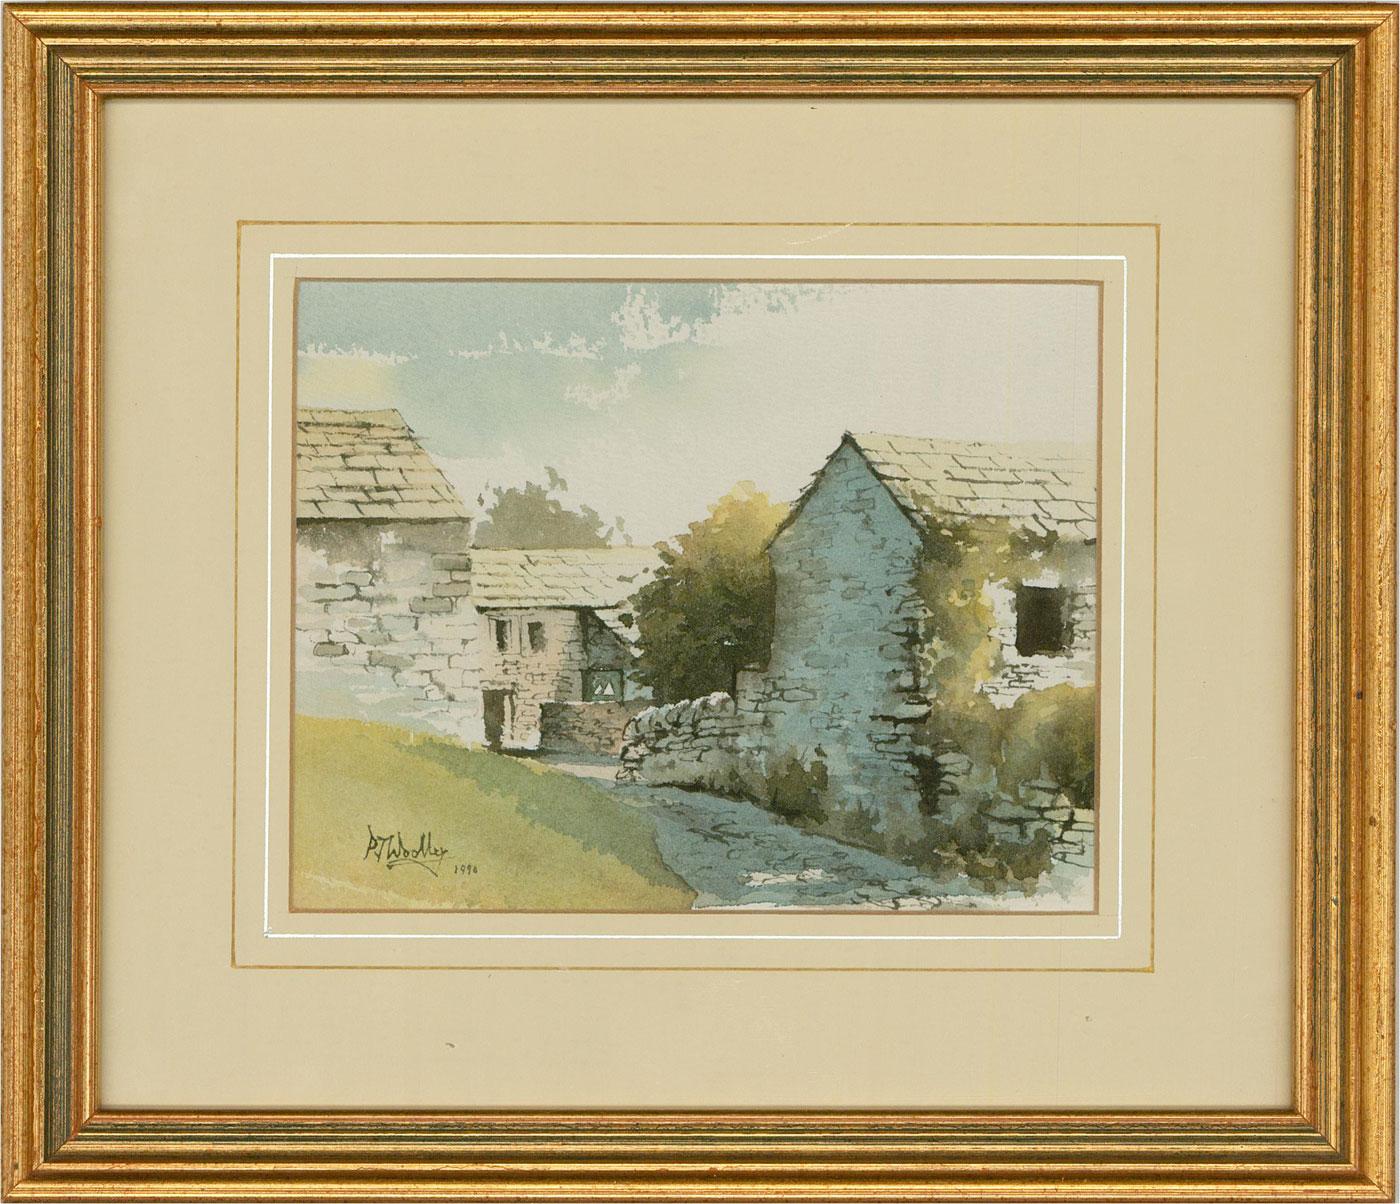 Peter Woolley - 1990 Watercolour, Grassington Scene